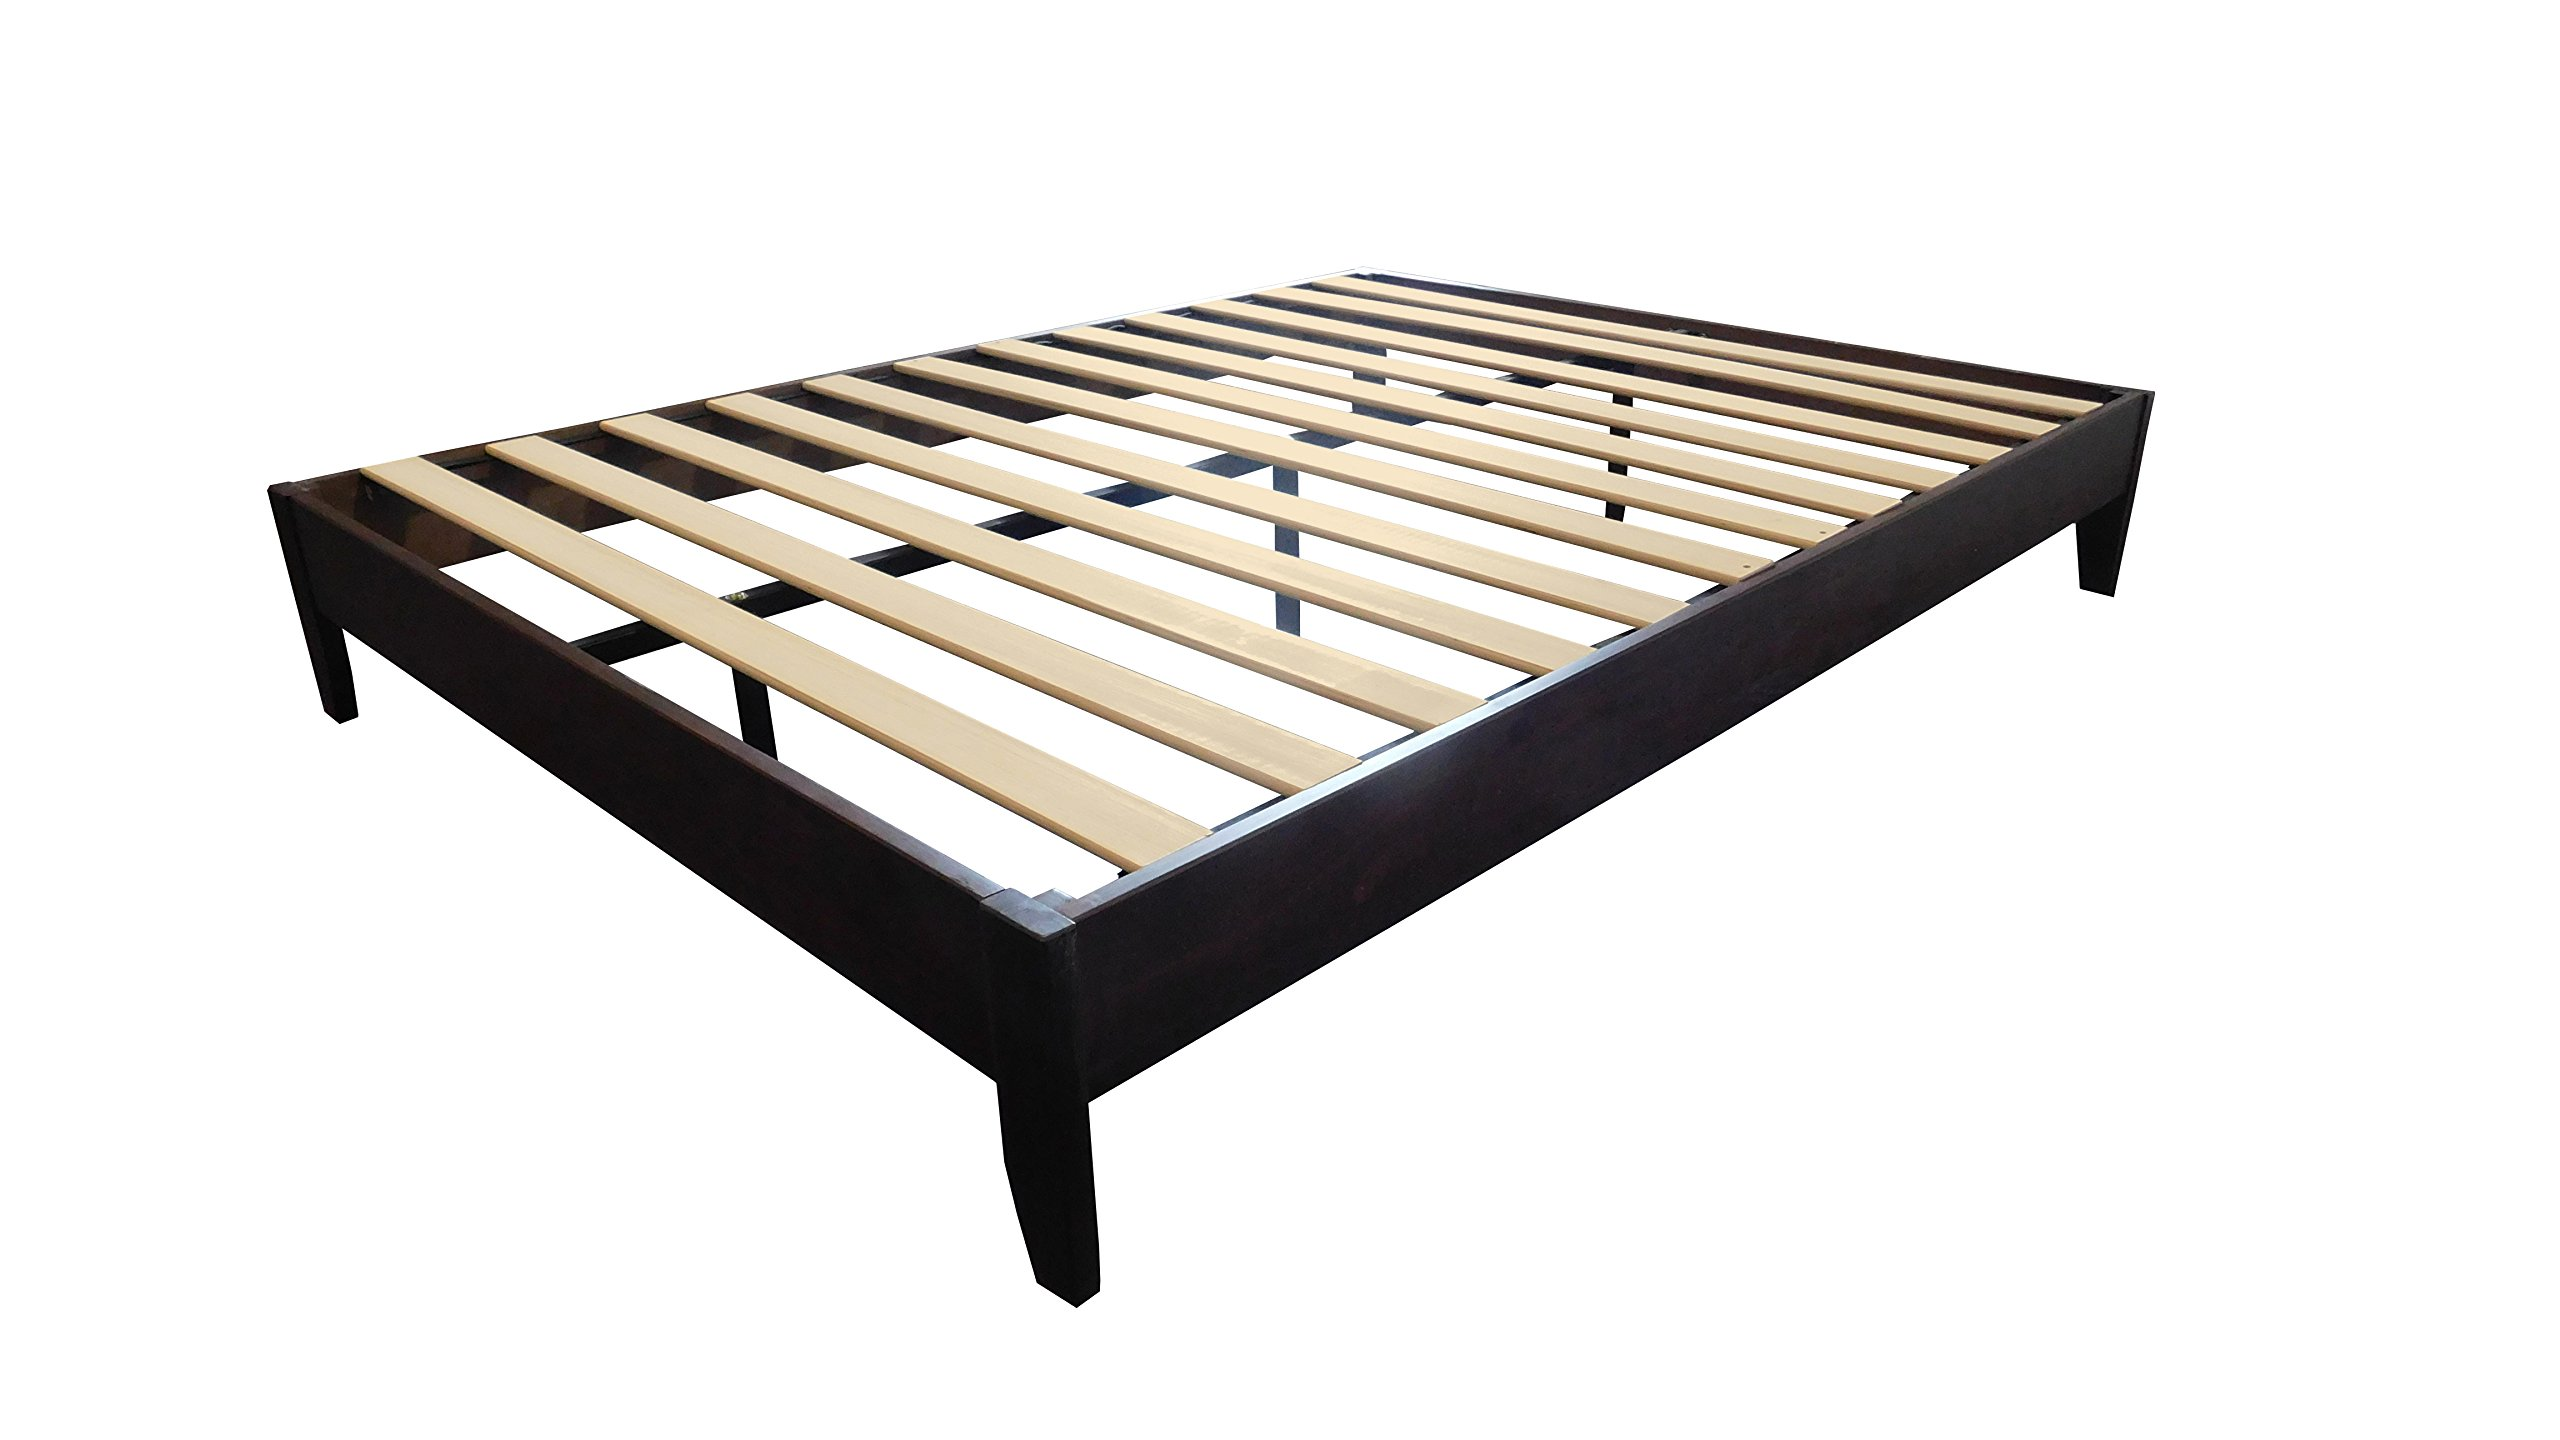 Target Marketing Systems 88590ESP Devin Queen Wood Platform Bed, Espresso by Target Marketing Systems